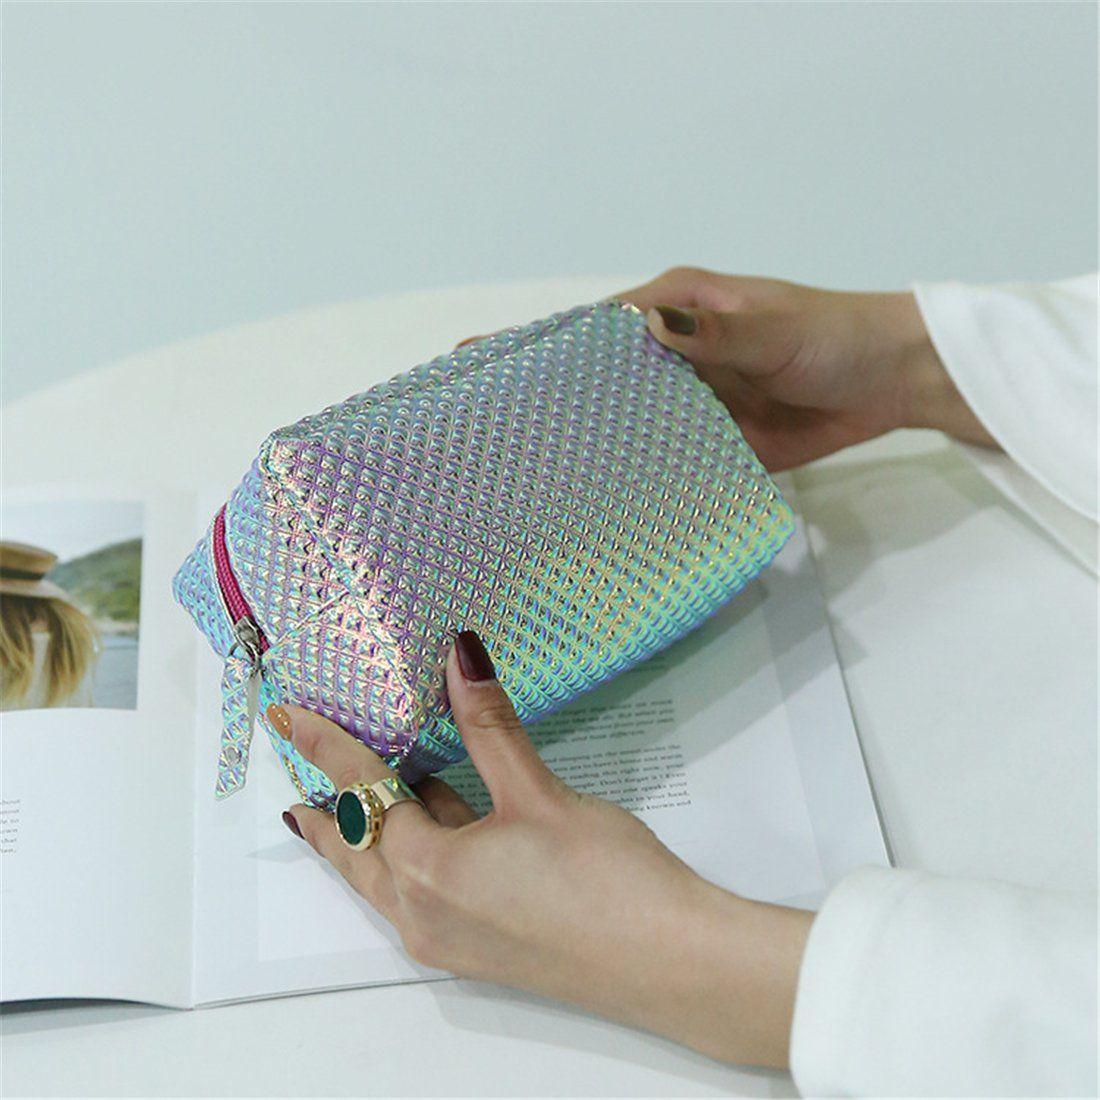 Susanki Holographic Plaid Makeup Bag Large Cosmetic Pouch